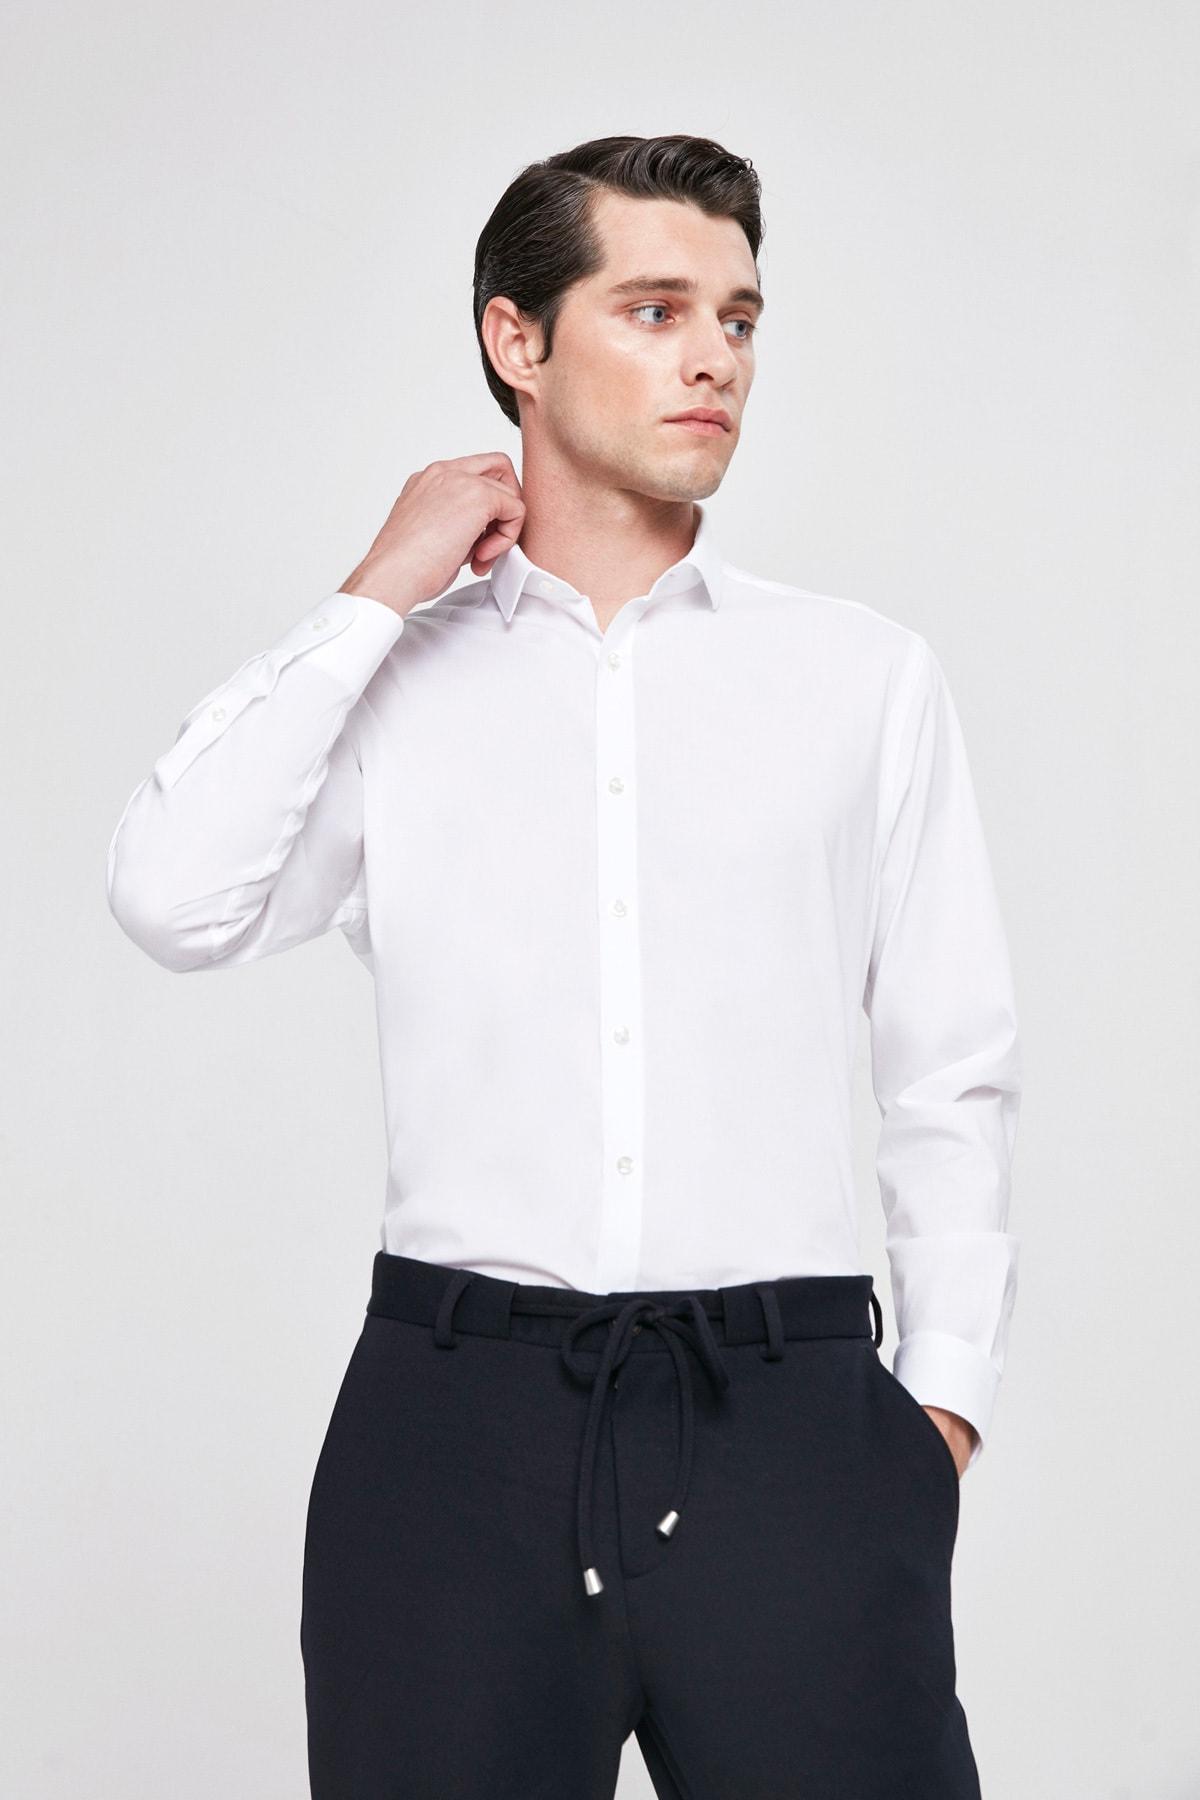 Twn Beyaz Renk Erkek  Gömlek (Slim Fit) 1